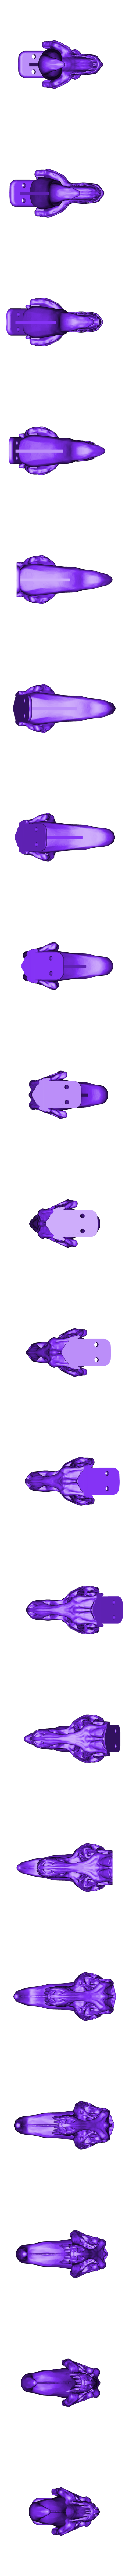 TRex_Tongue_Hook_v3.stl Download free STL file T-REX Remix Bathroom Set • Design to 3D print, Dournard